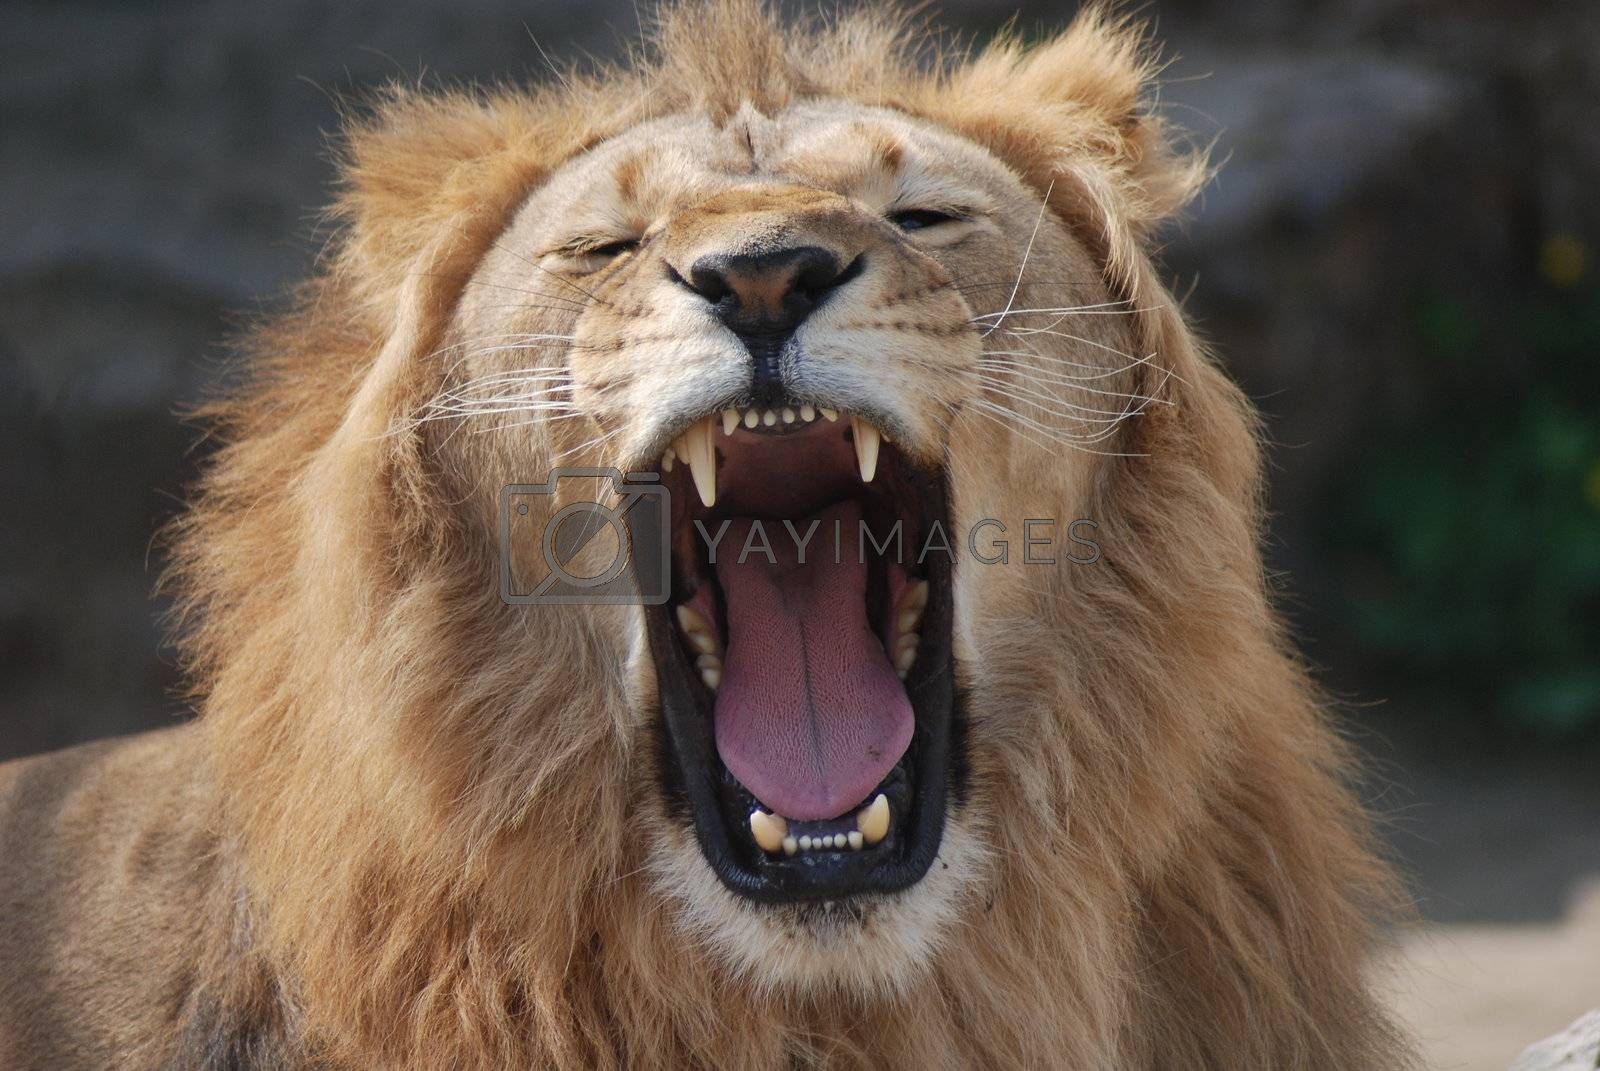 Head of a wild lion close up